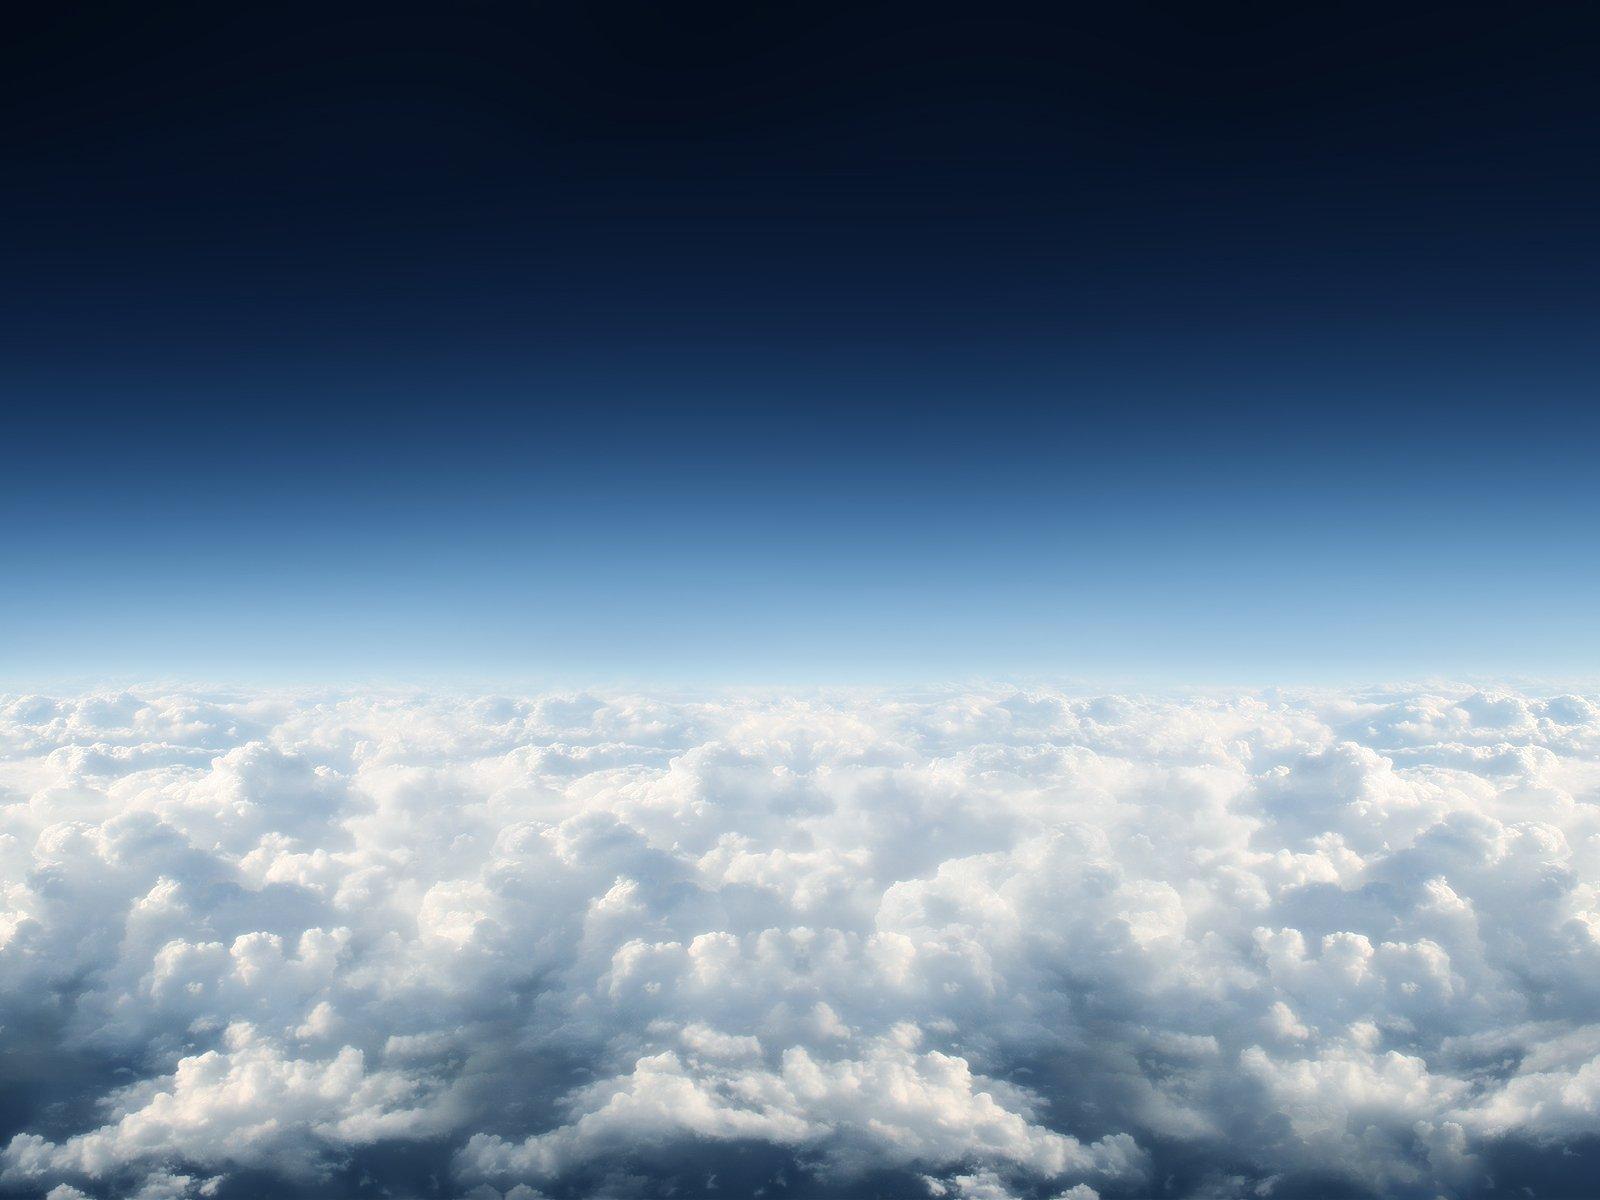 Jorden/Natur - Himmel  Cloud Bakgrund